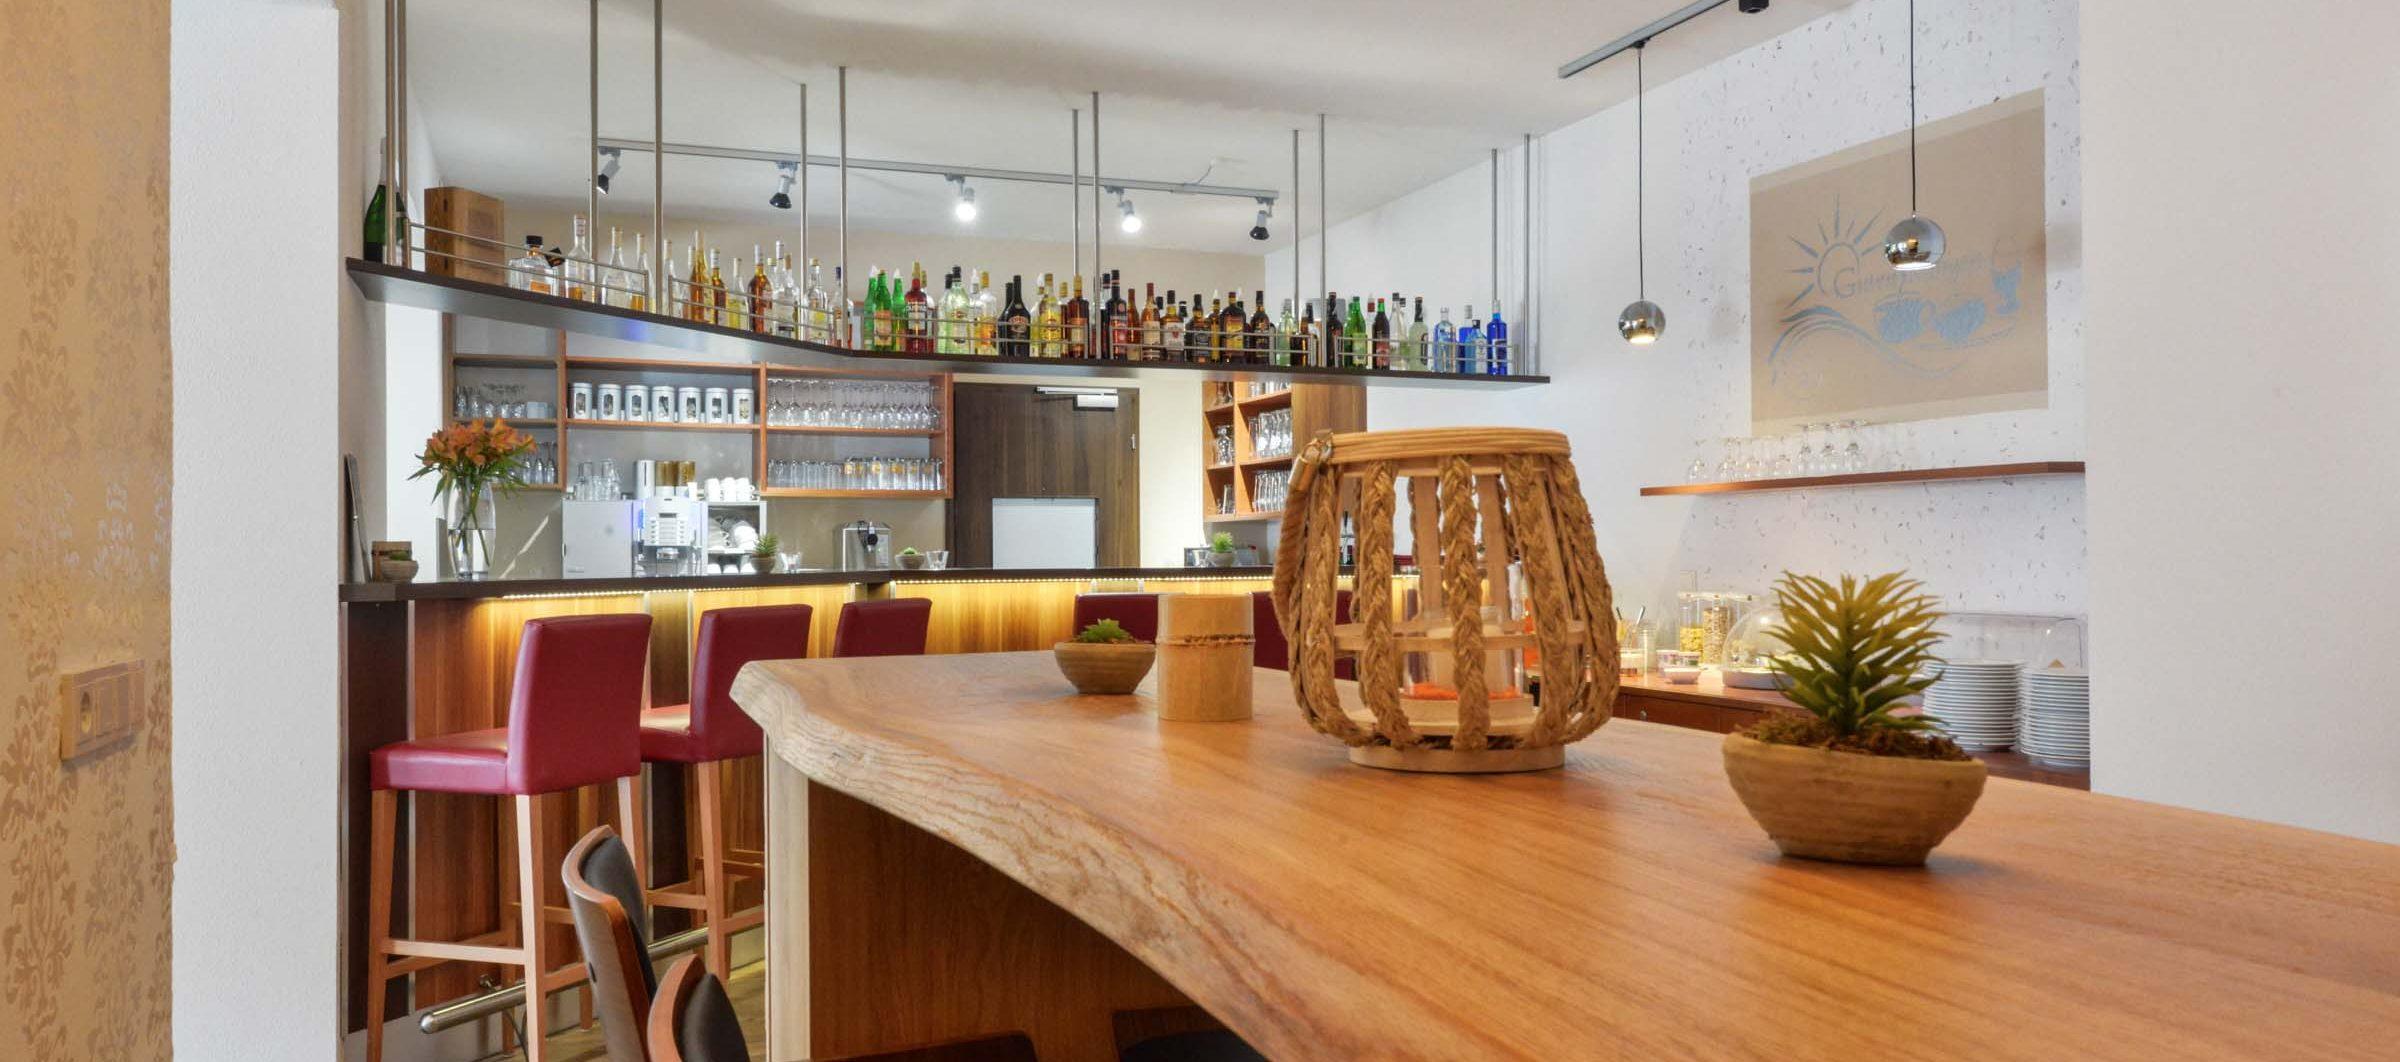 Hotel Renner Buchbach Bar